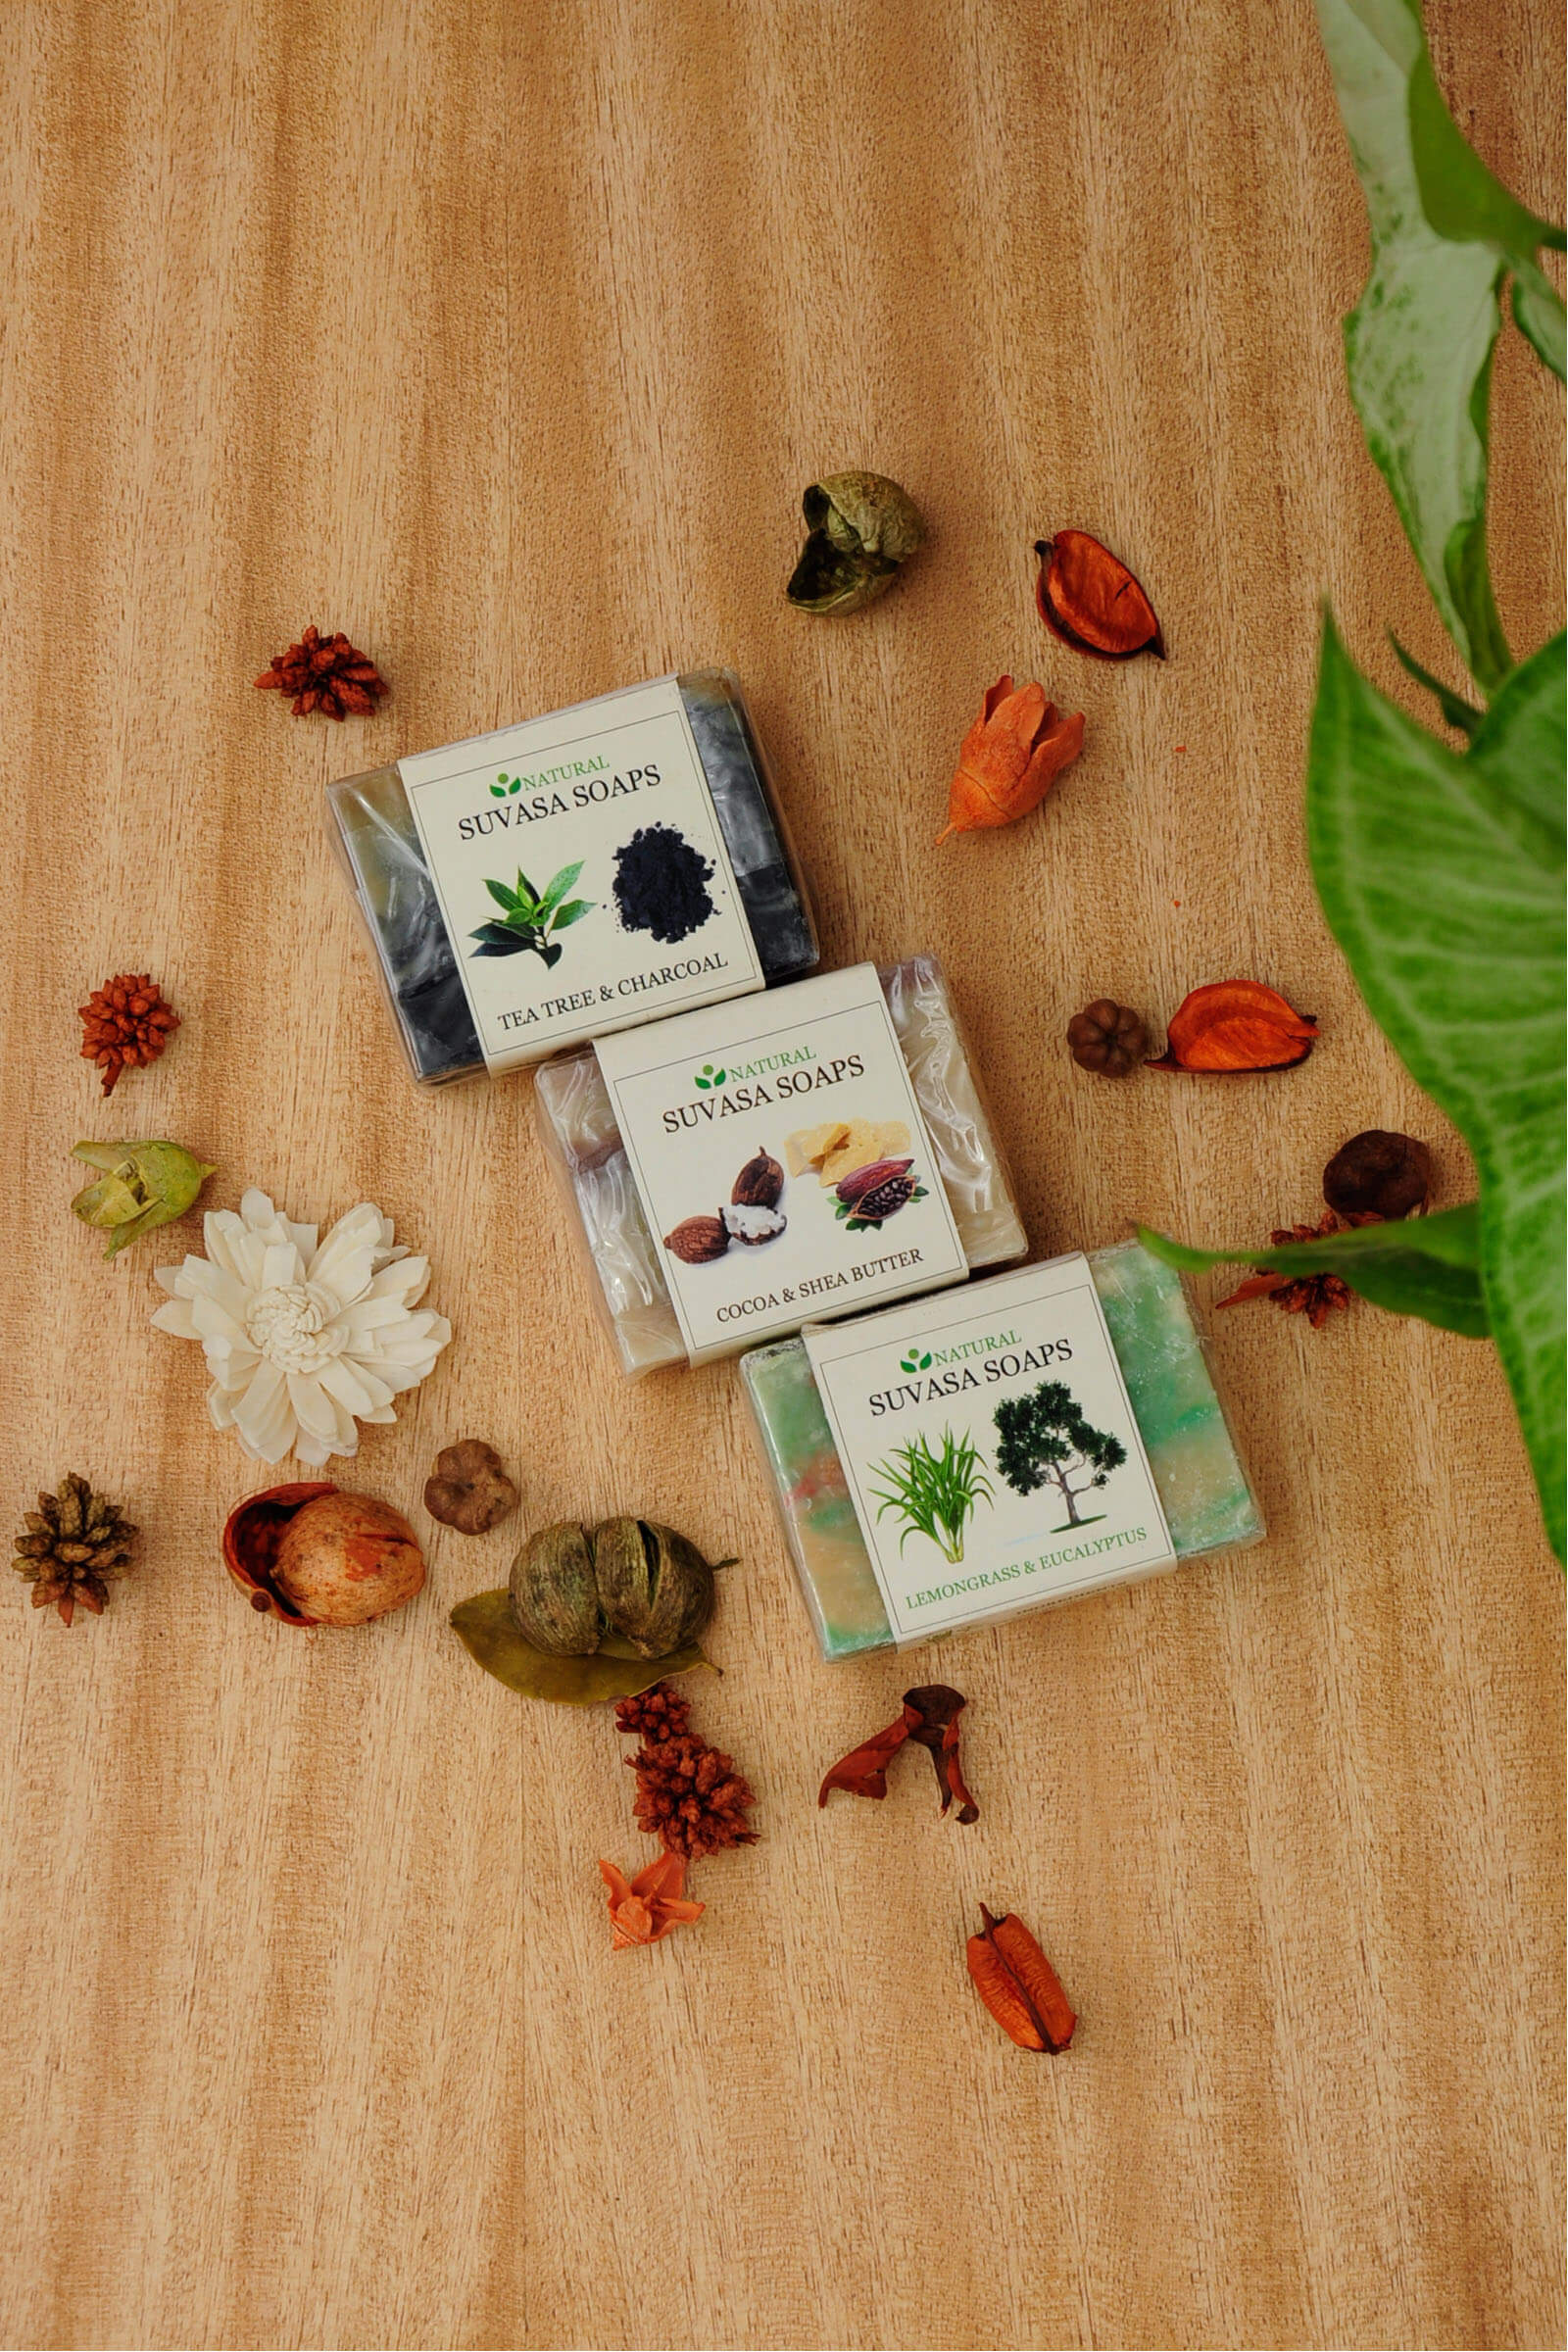 Tea Tree & Charcoal